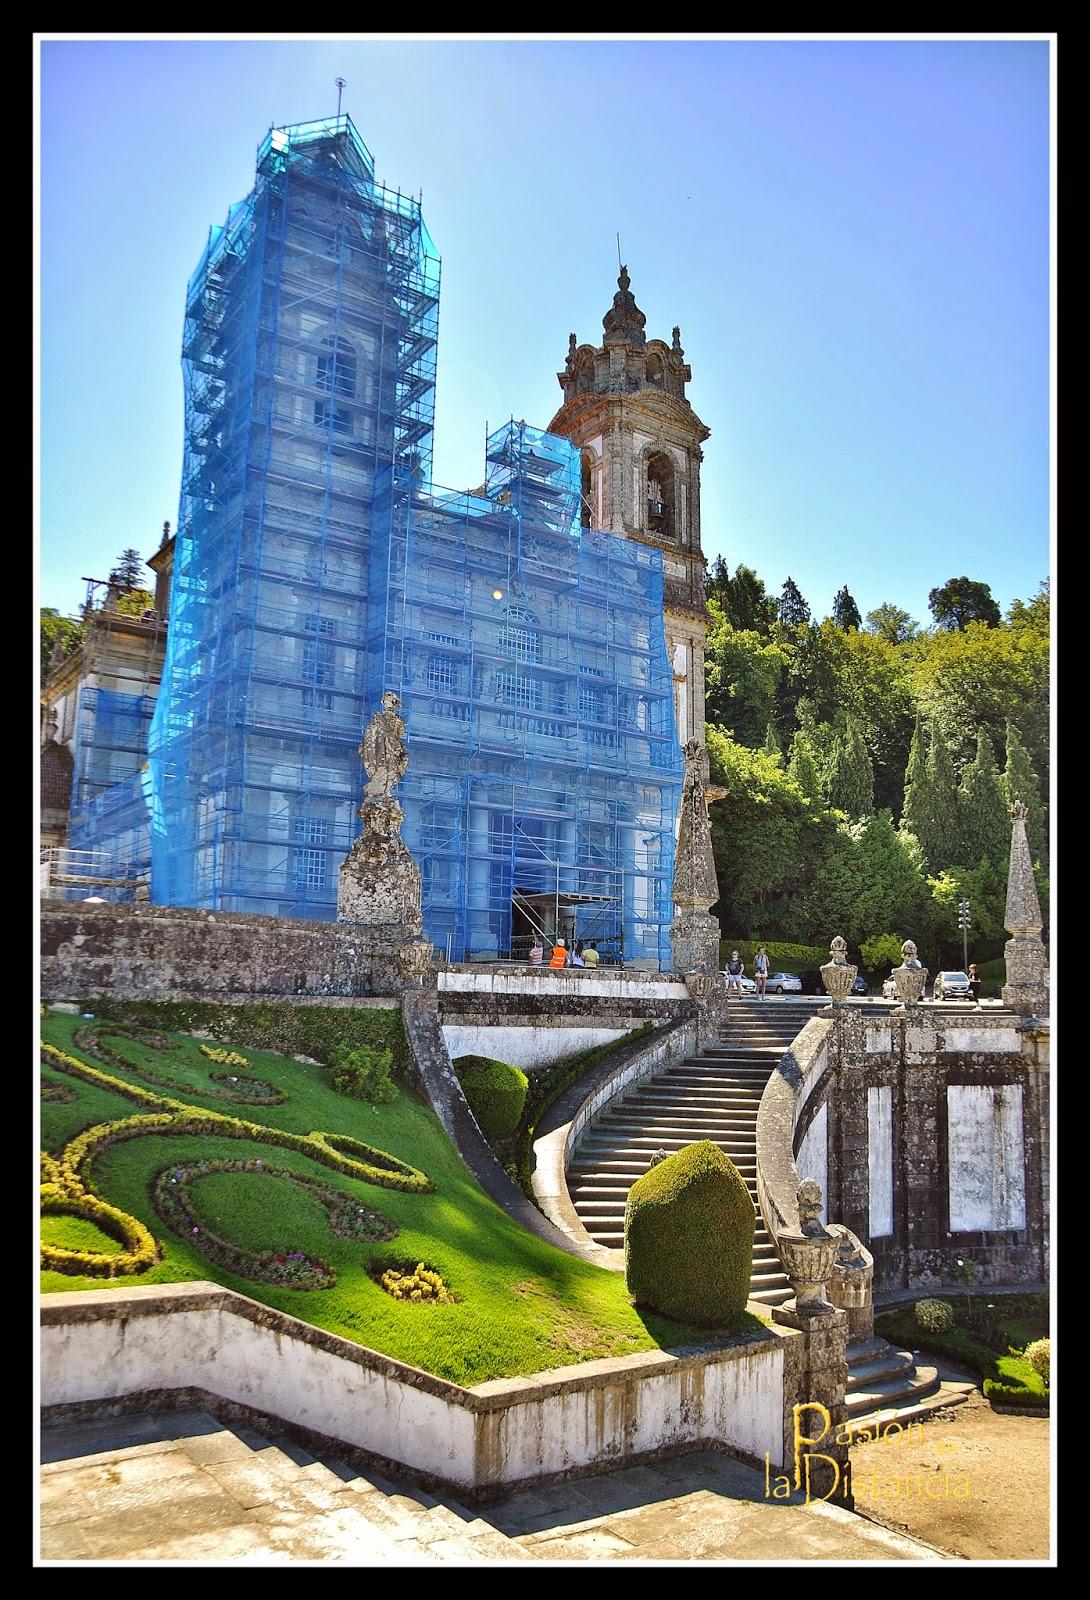 Bom-Jesú-do-monte-Braga-Portugal